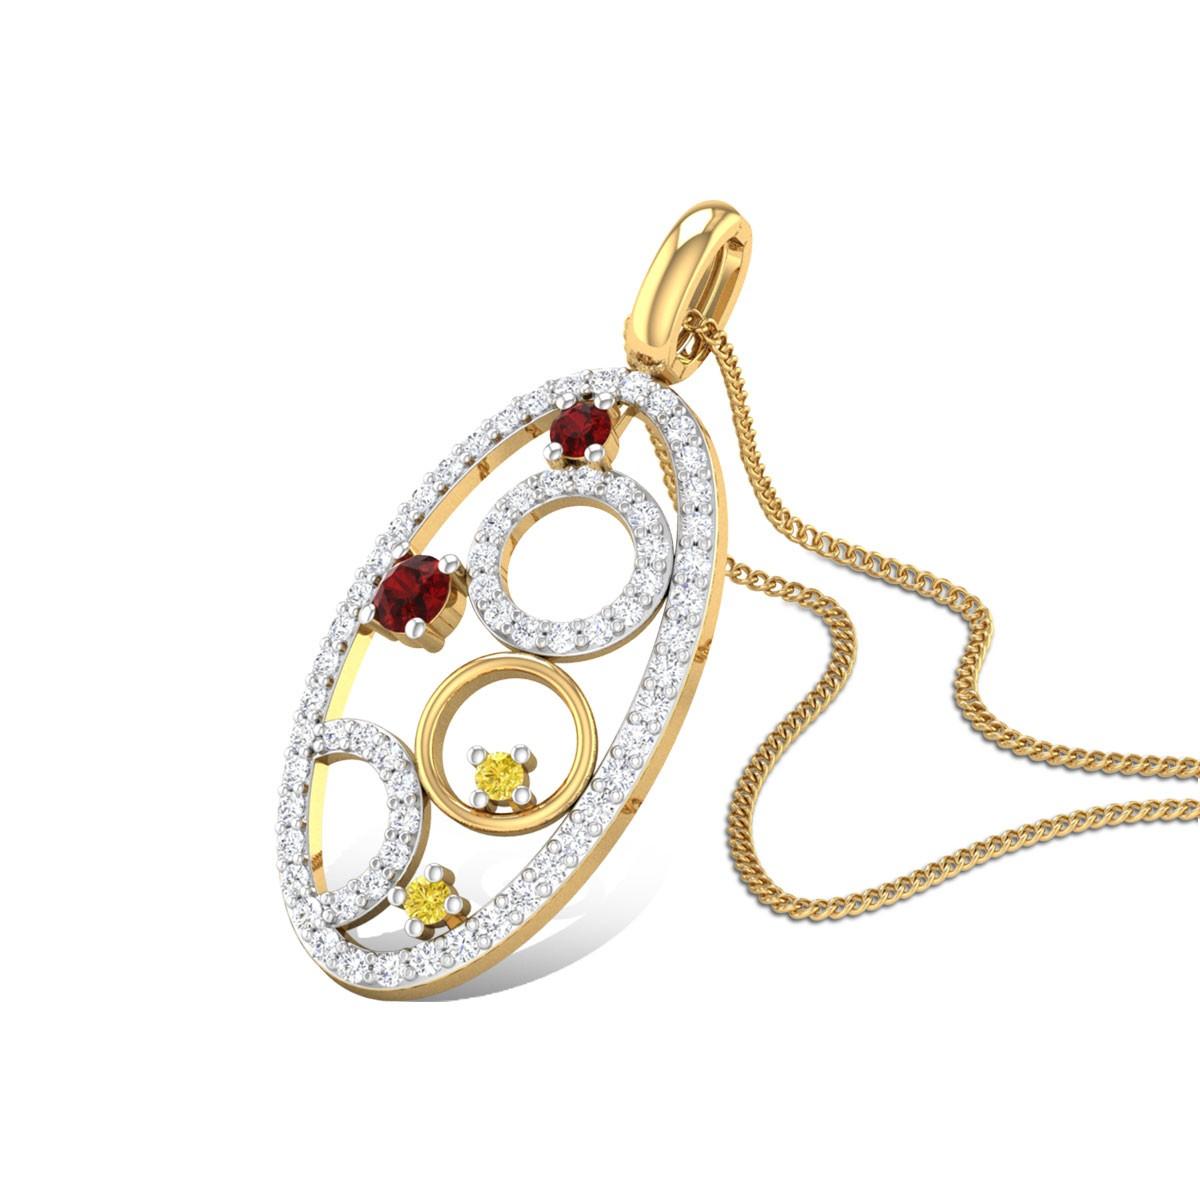 Alastor Diamond and Ruby Pendant